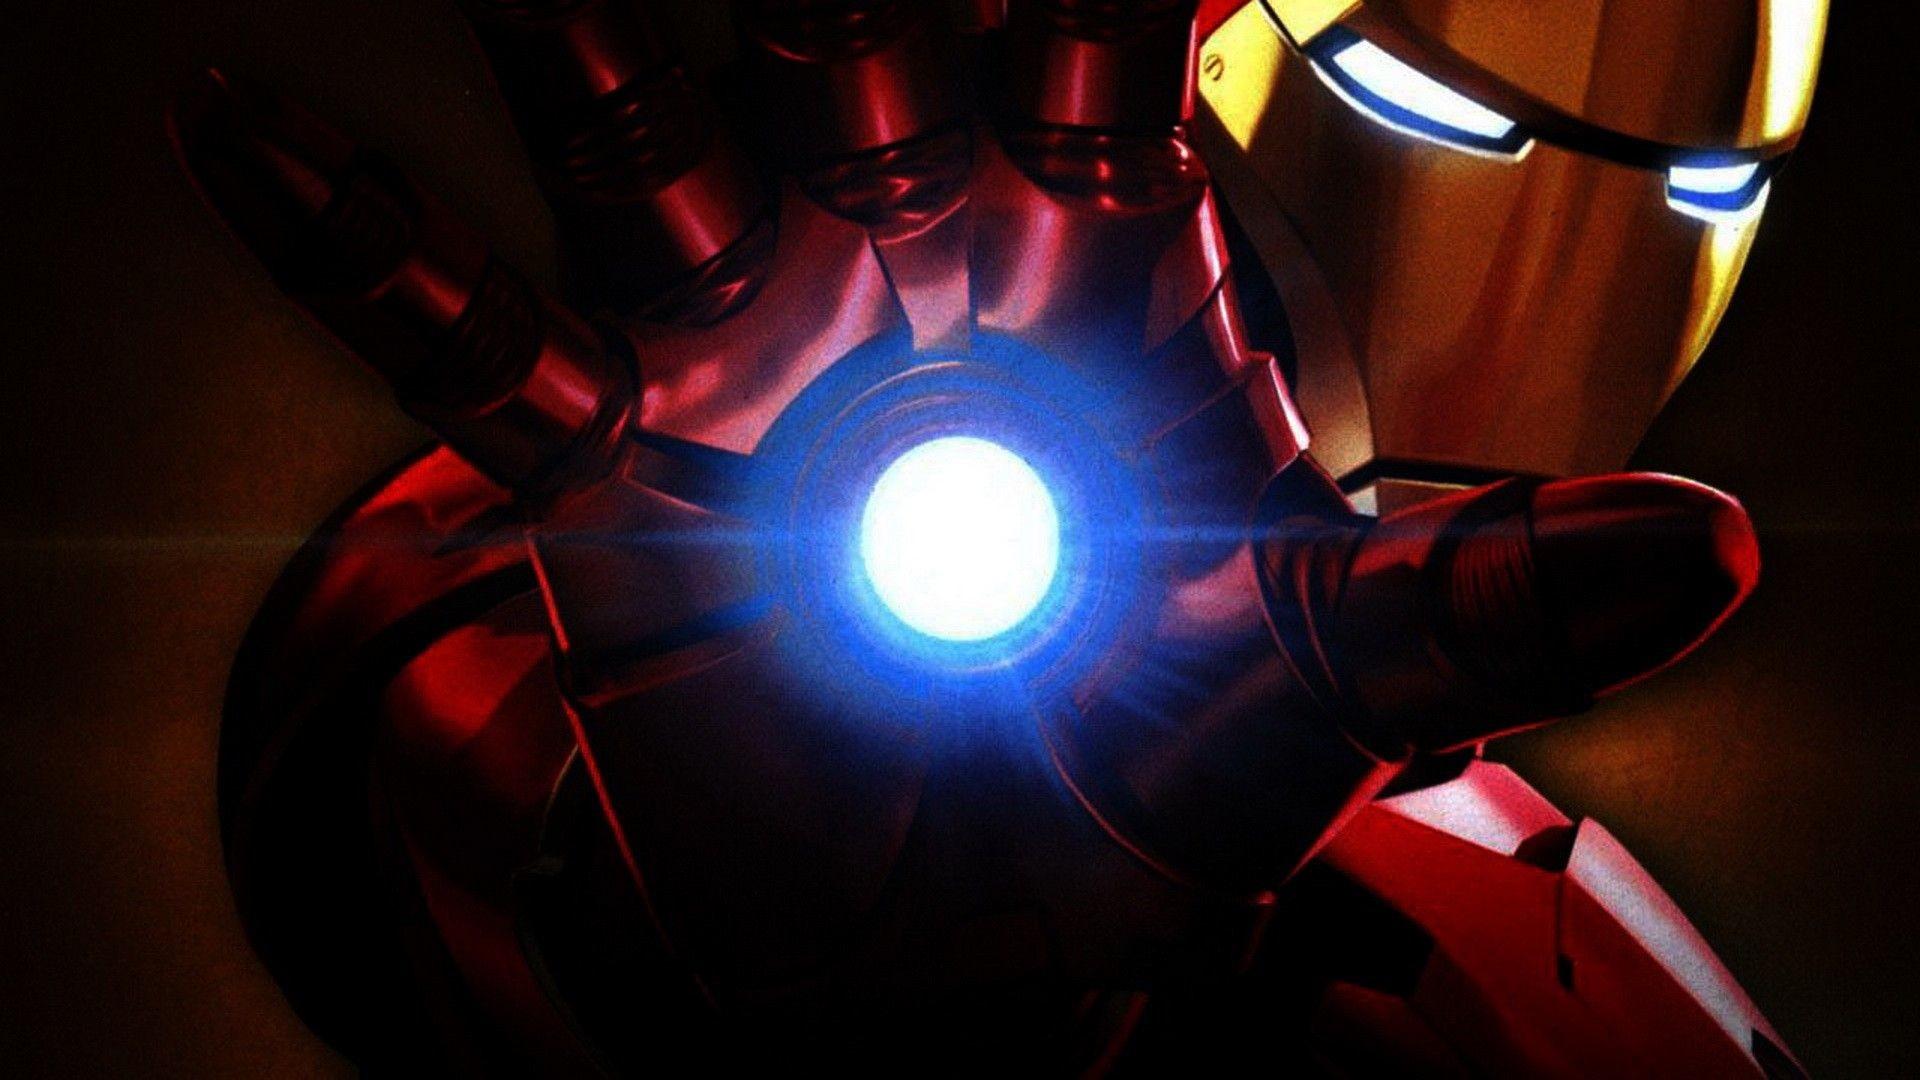 … Iron Man Hd Wallpapers For Desktop 25. Download